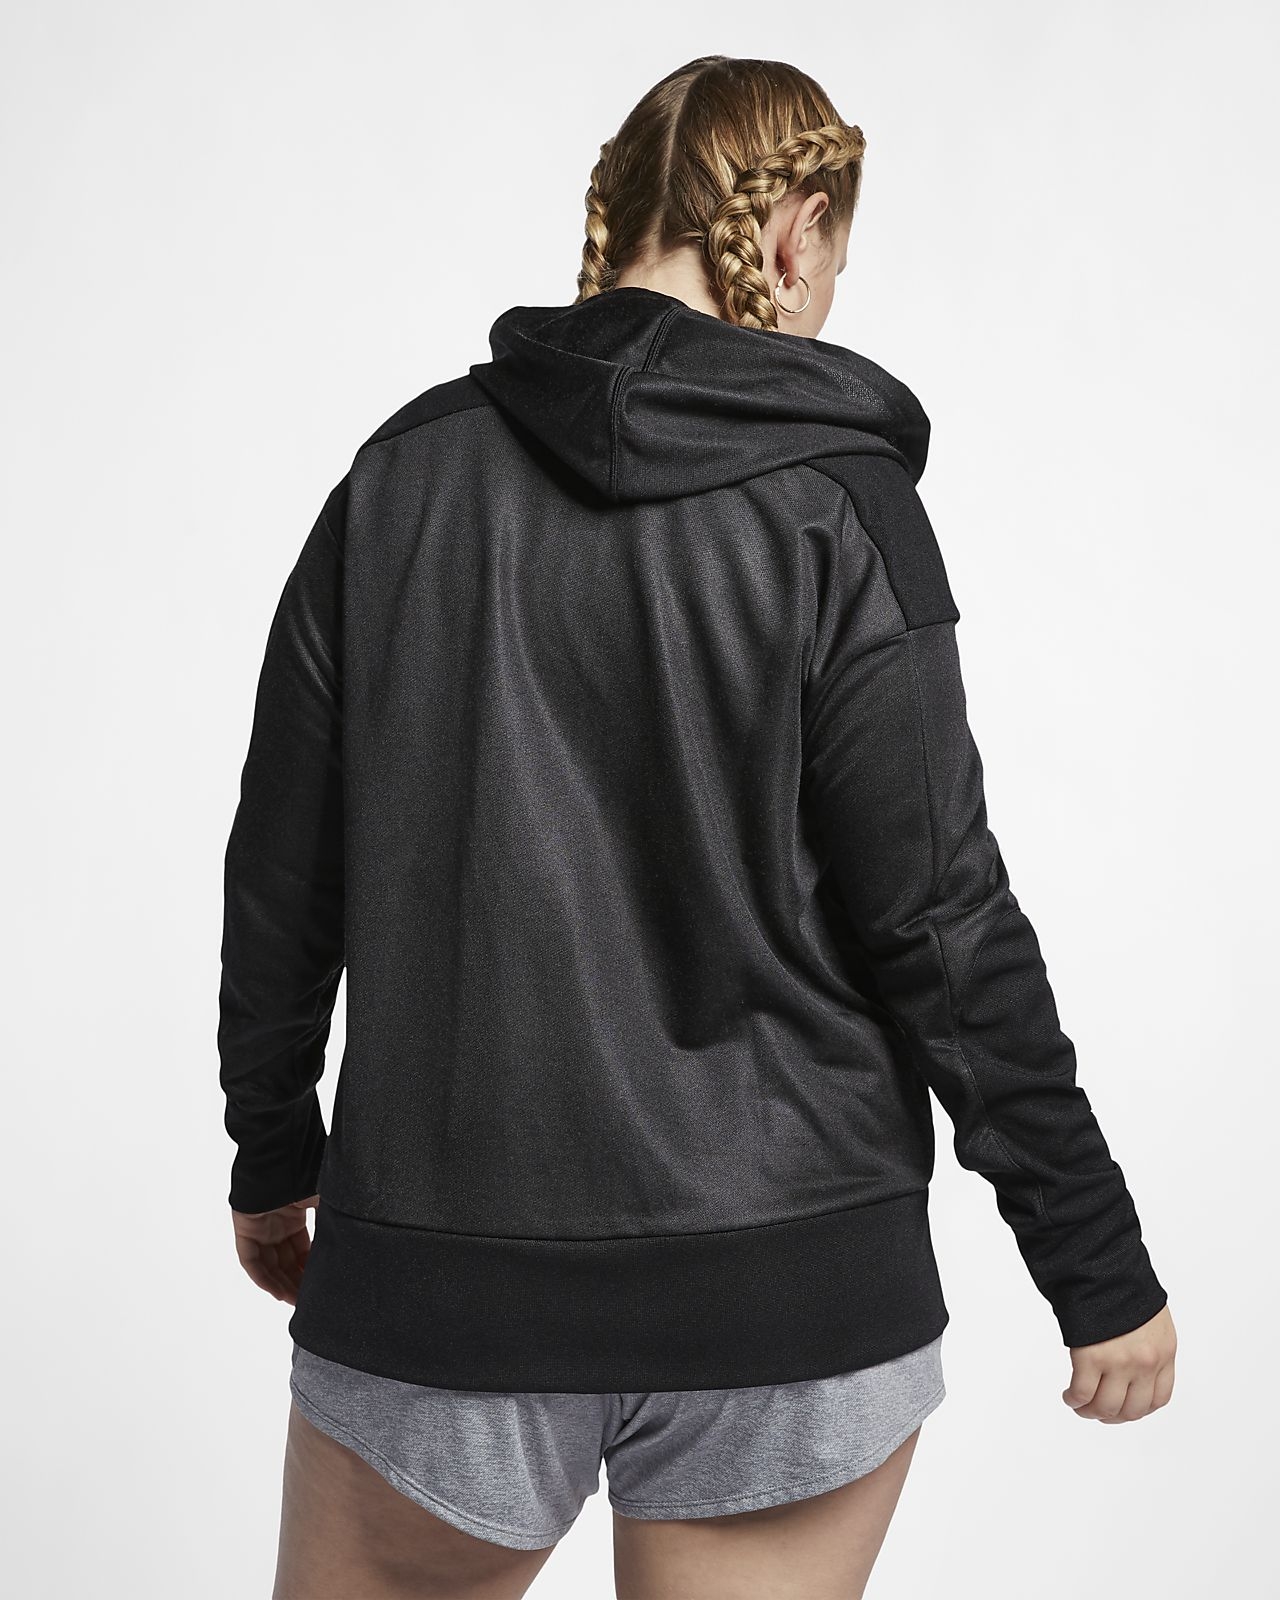 8eb8a77cde0 Nike Dri-FIT (Plus Size) Women s Full-Zip Training Hoodie. Nike.com AU